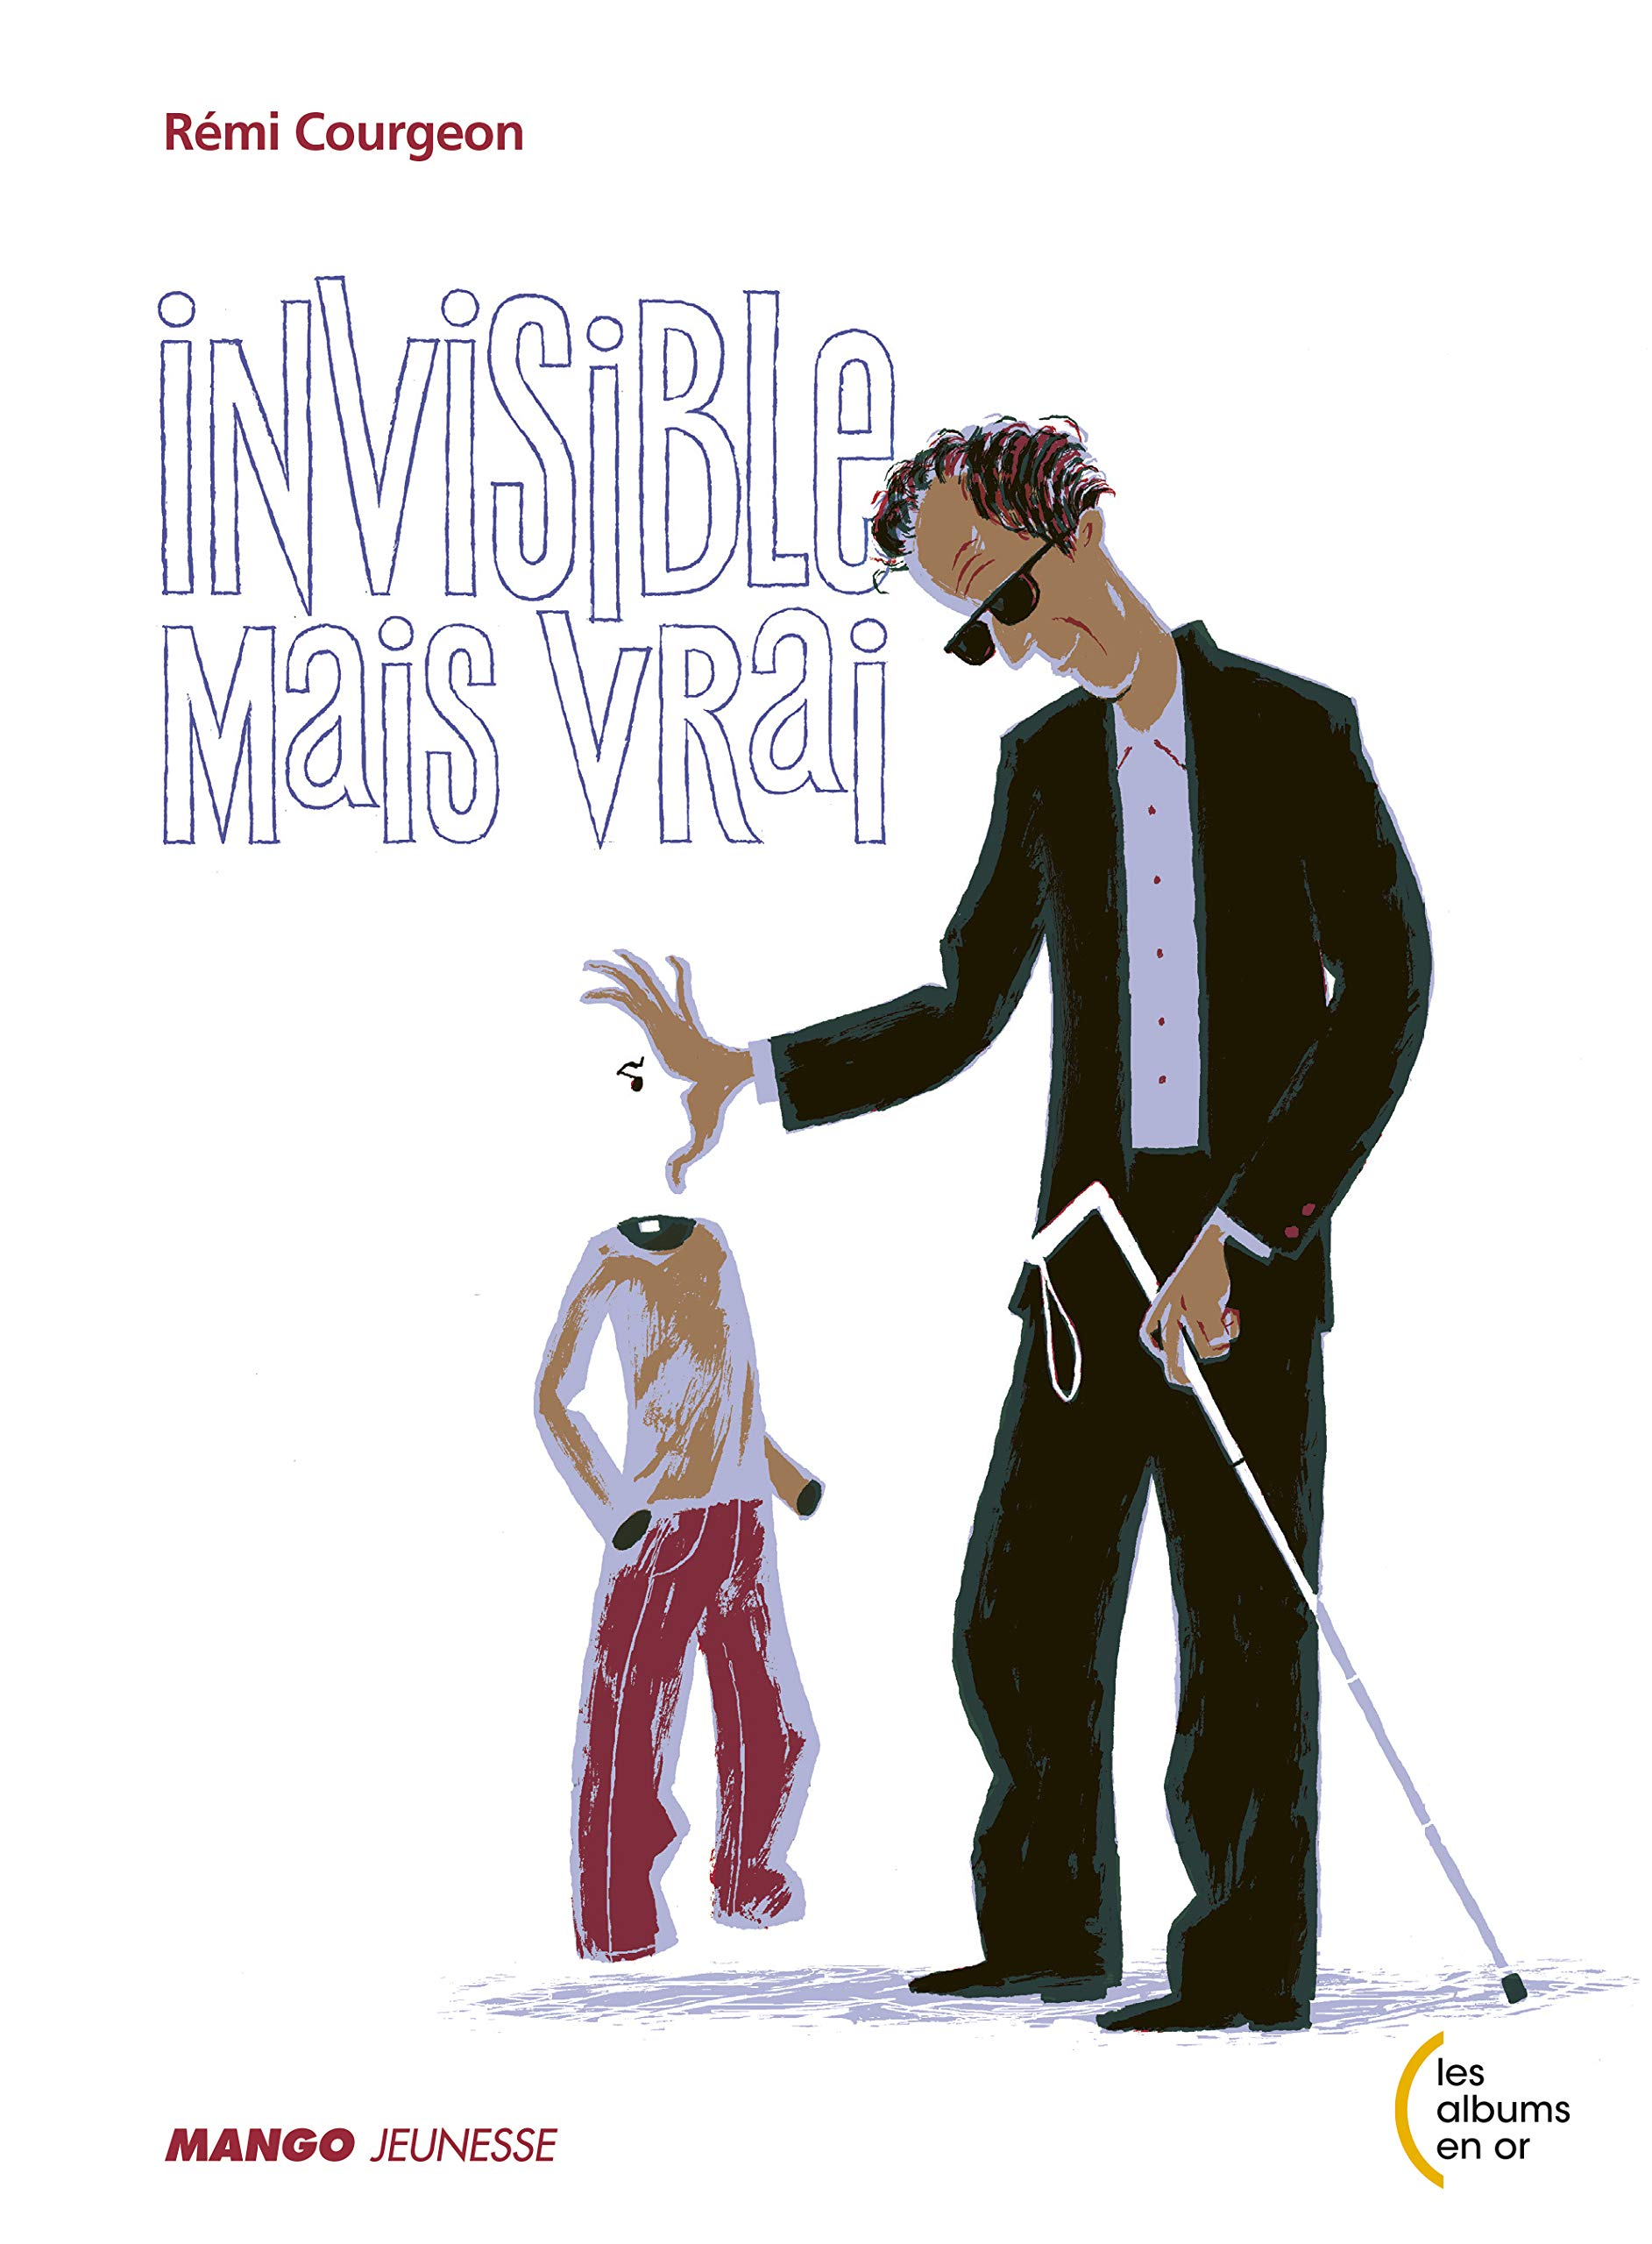 Invisible mais vrai (Les albums en or): Amazon.es: Courgeon Remi: Libros en idiomas extranjeros